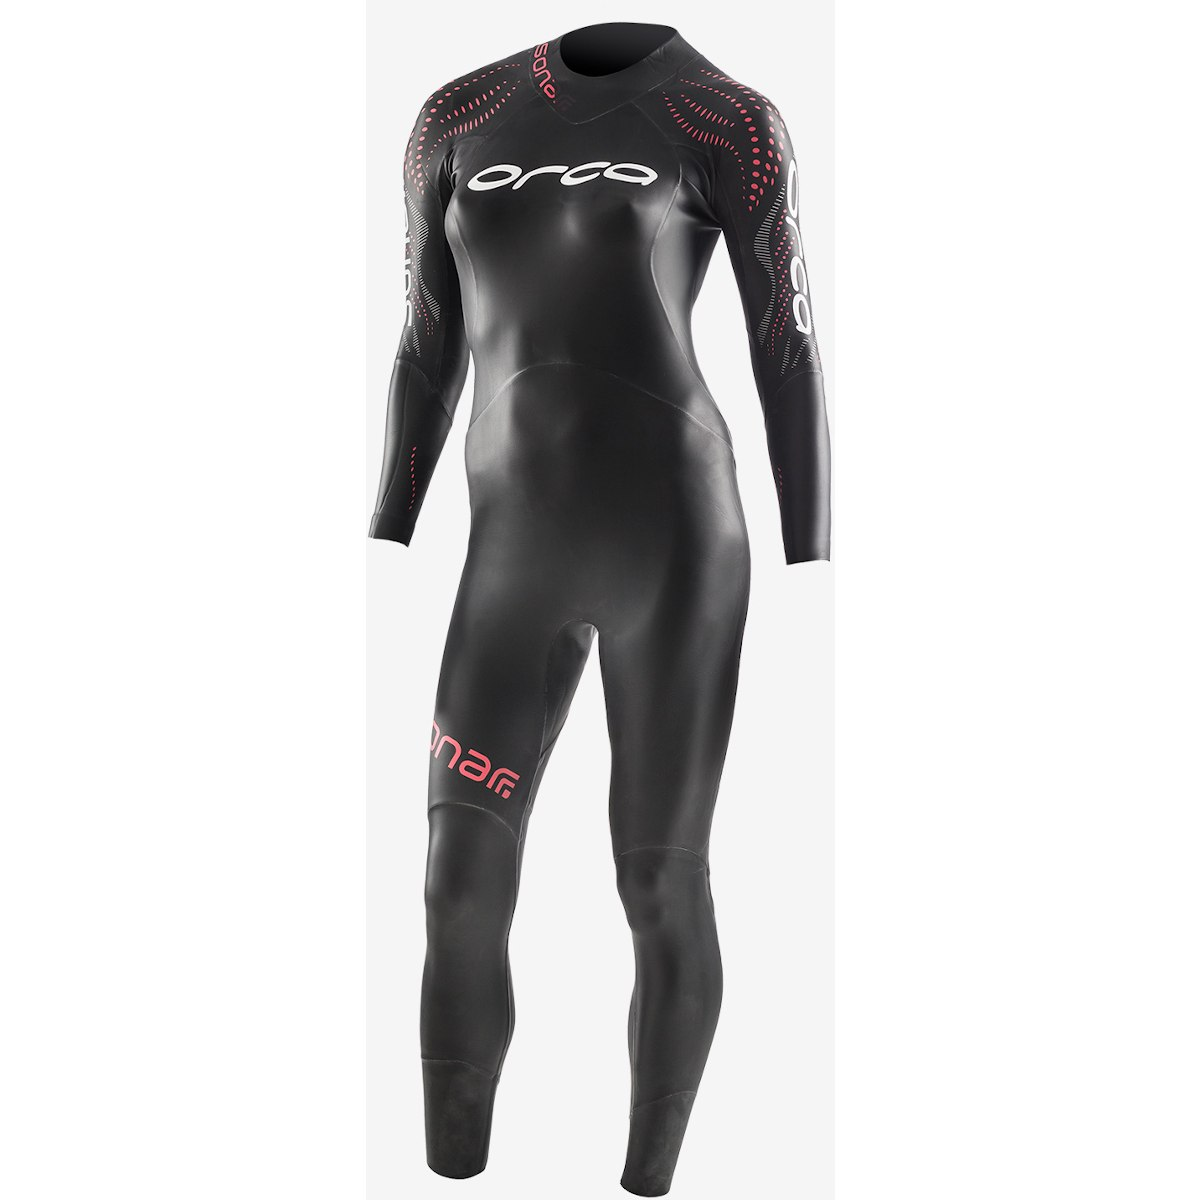 Orca Sonar Womens Wetsuit - black